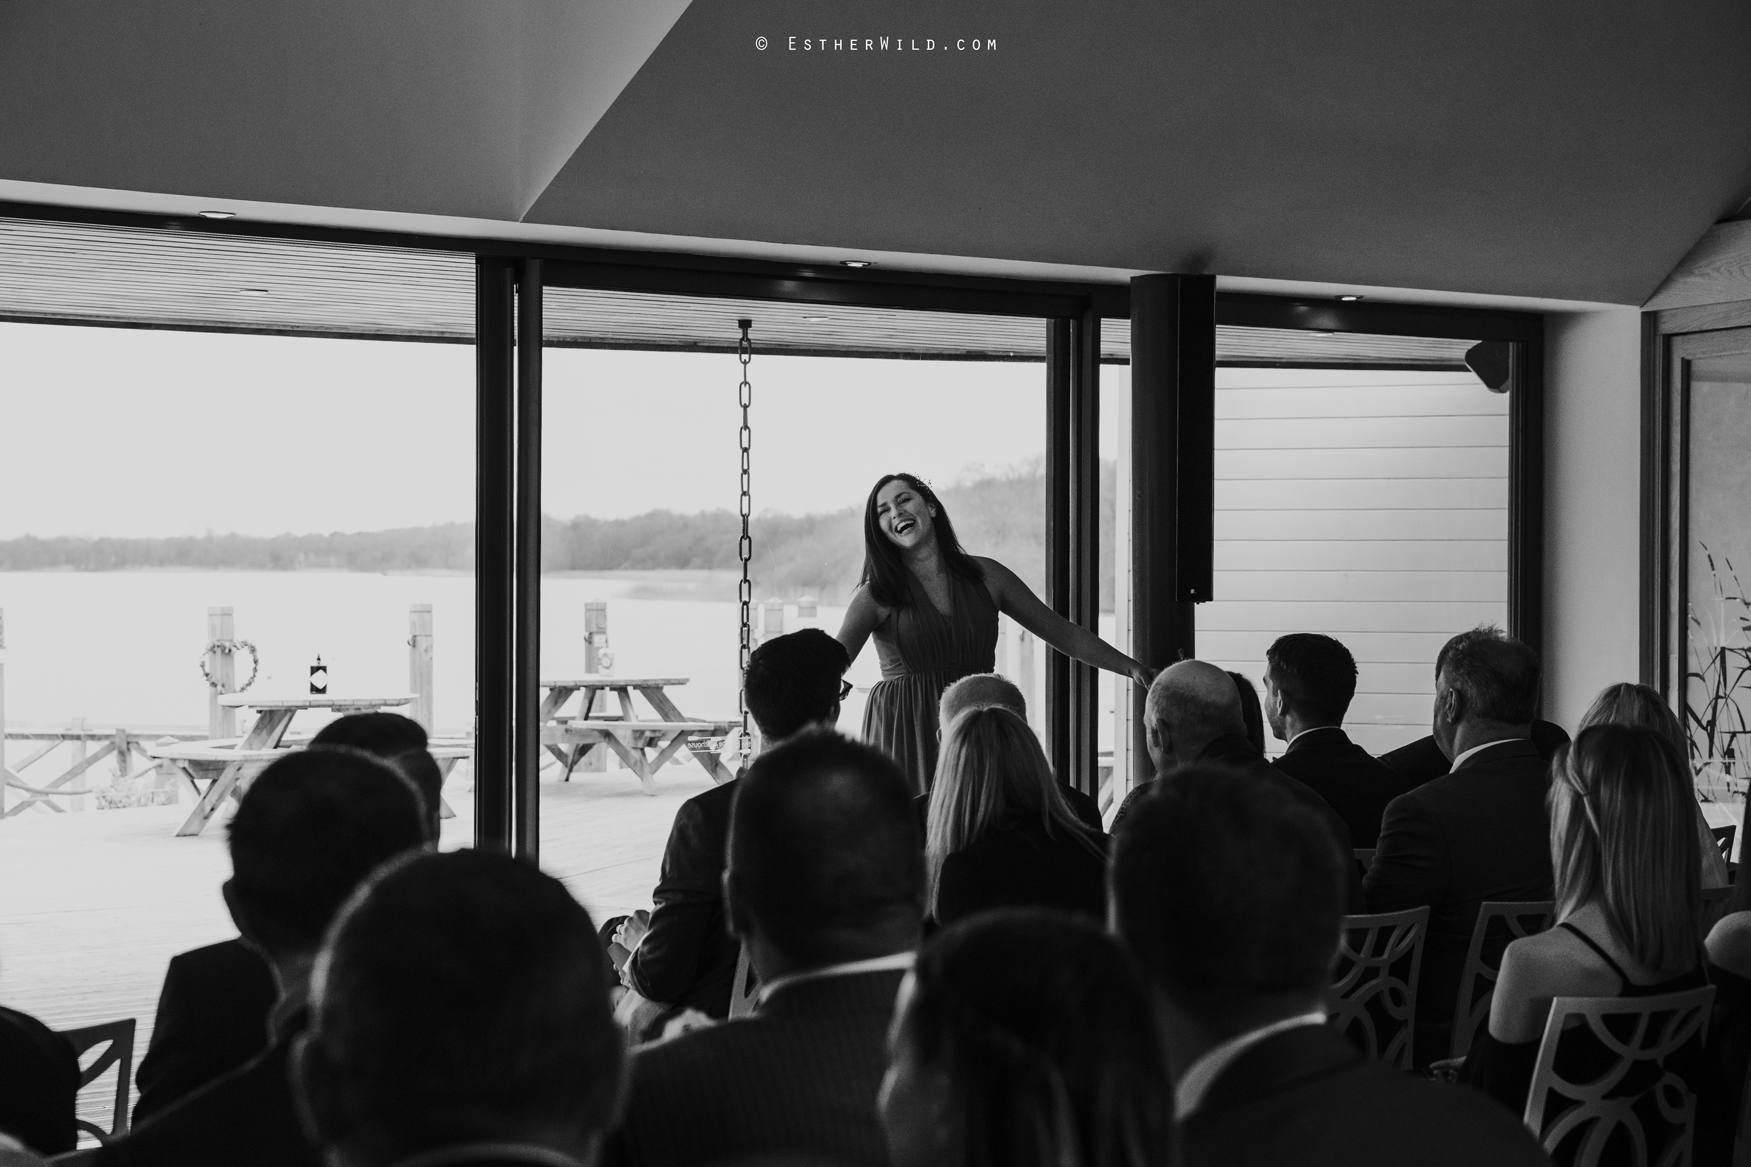 The_BoatHouse_Wedding_Venue_Ormesby_Norfolk_Broads_Boat_Wedding_Photography_Esther_Wild_Photographer_IMG_1279.jpg